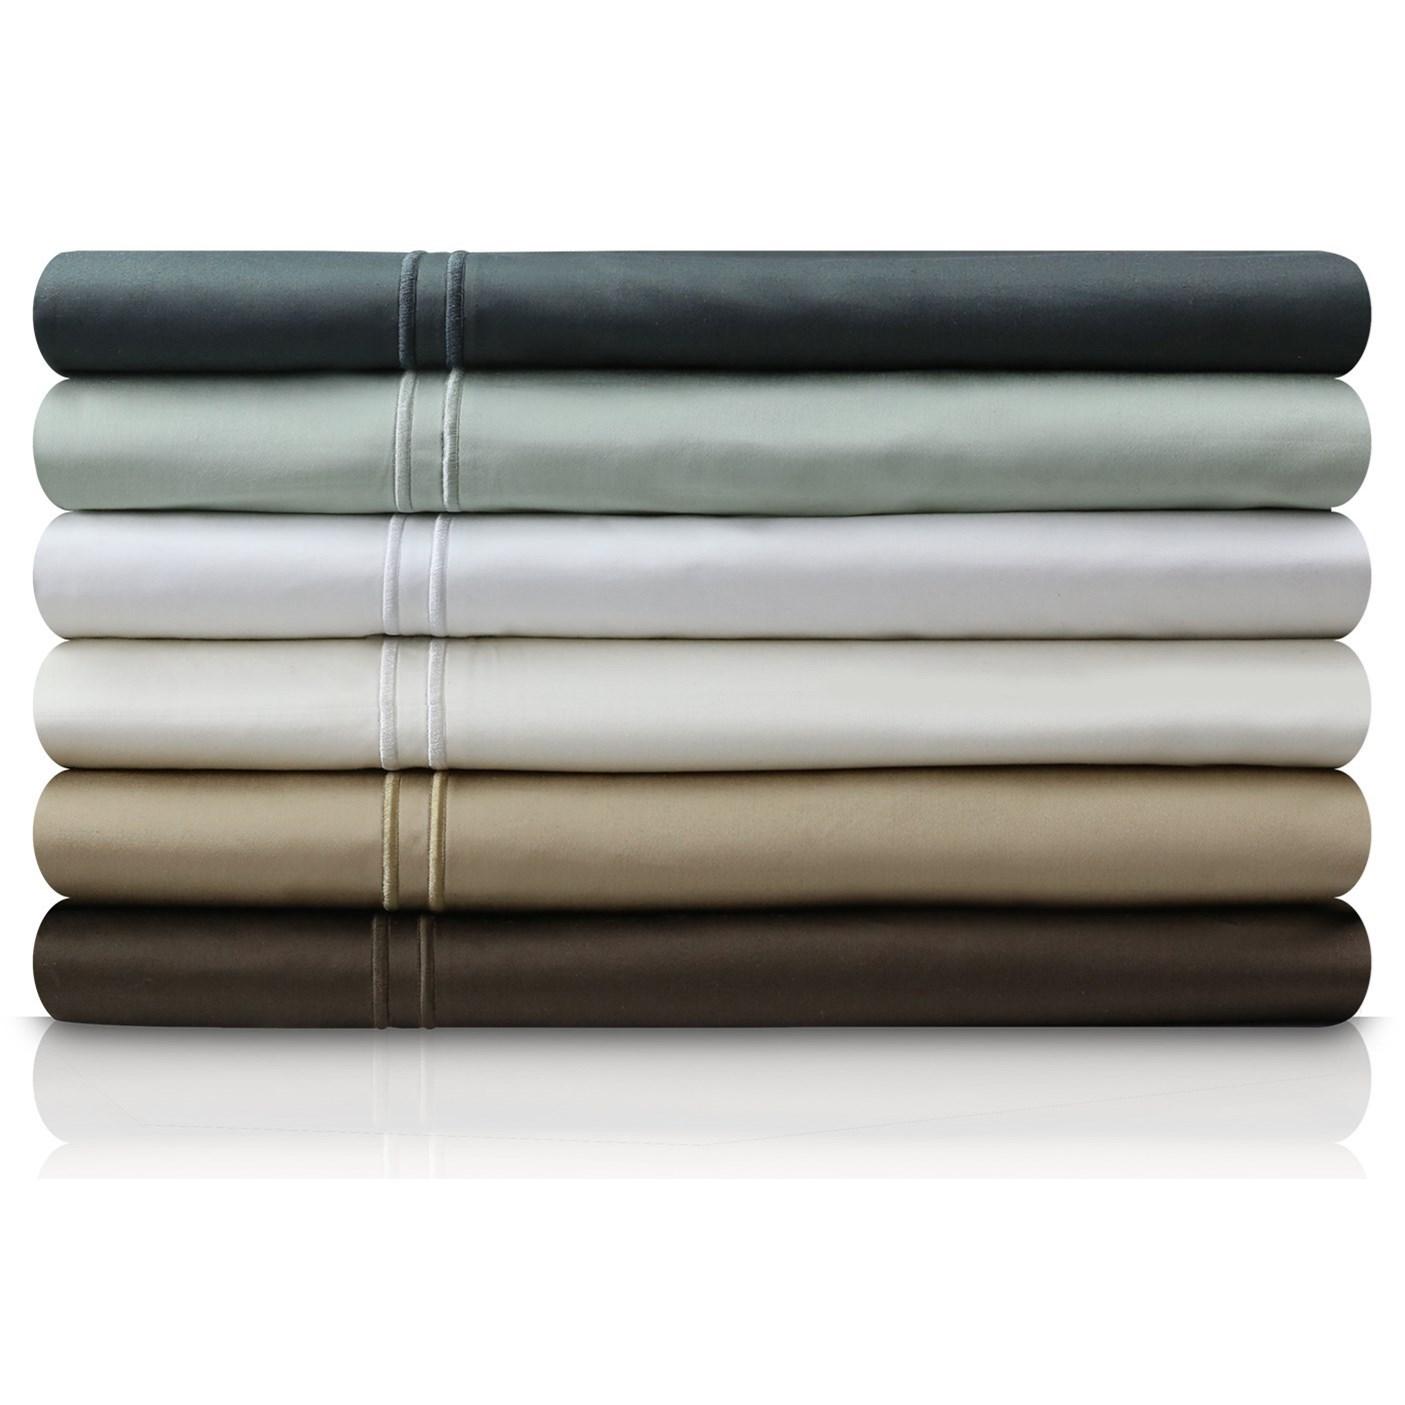 Malouf Egyptian Cotton Full XL 600 TC Egyptian Cotton Sheet Set - Item Number: MA06FXIVSS